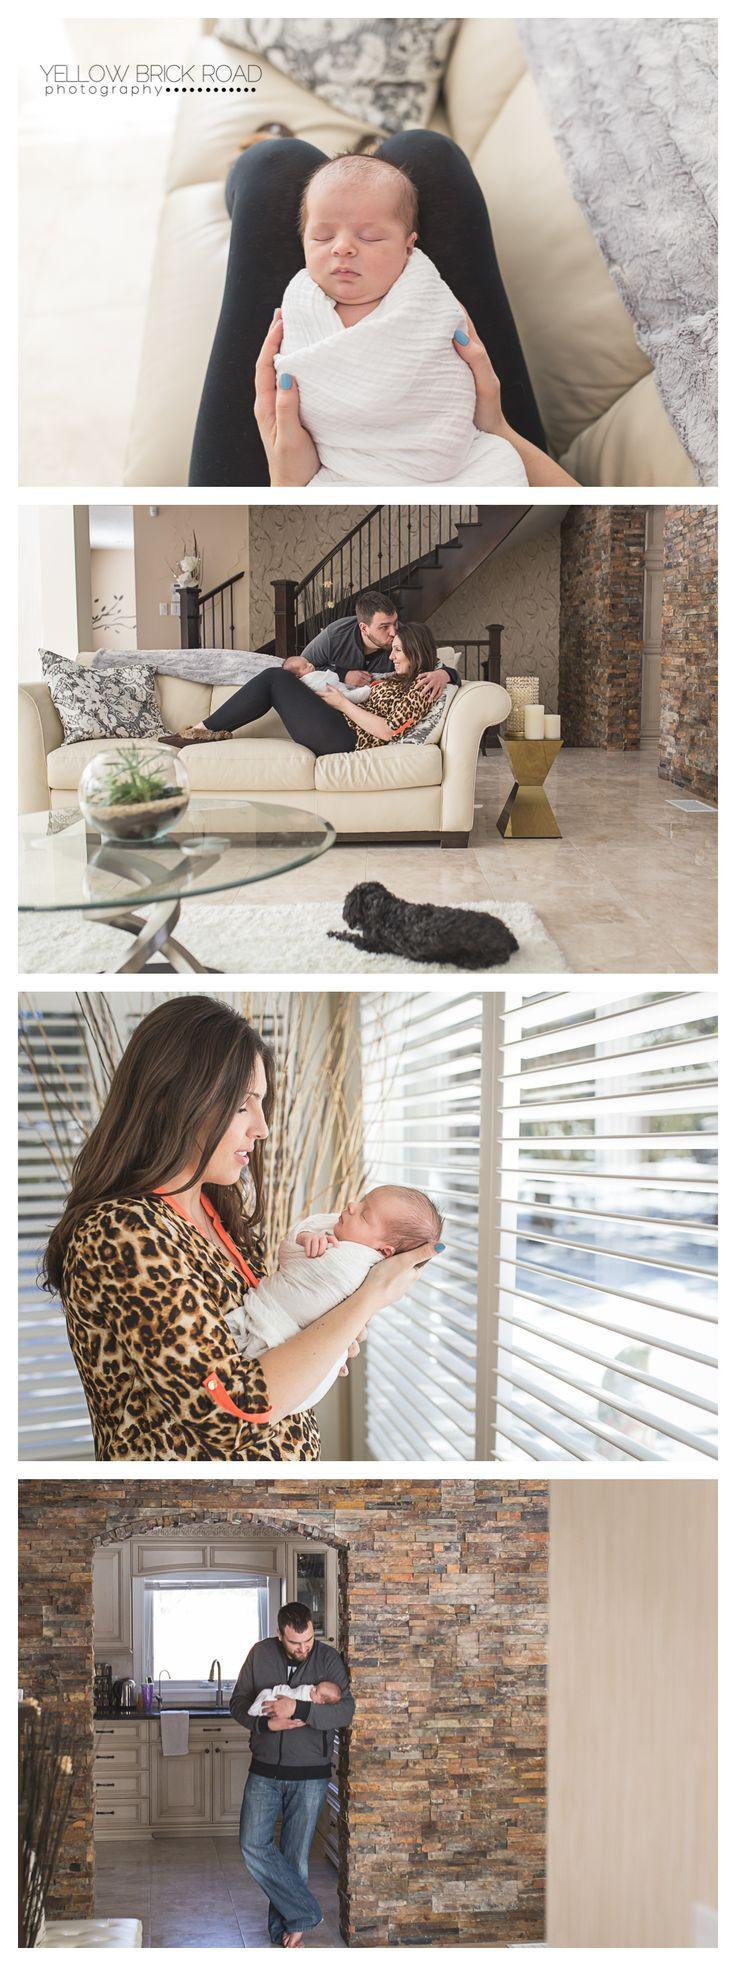 Kitchener Newborn Lifestyle session #newbornphotography #newborn #lifestyle #inhomesession #yellowbrickroadphotography